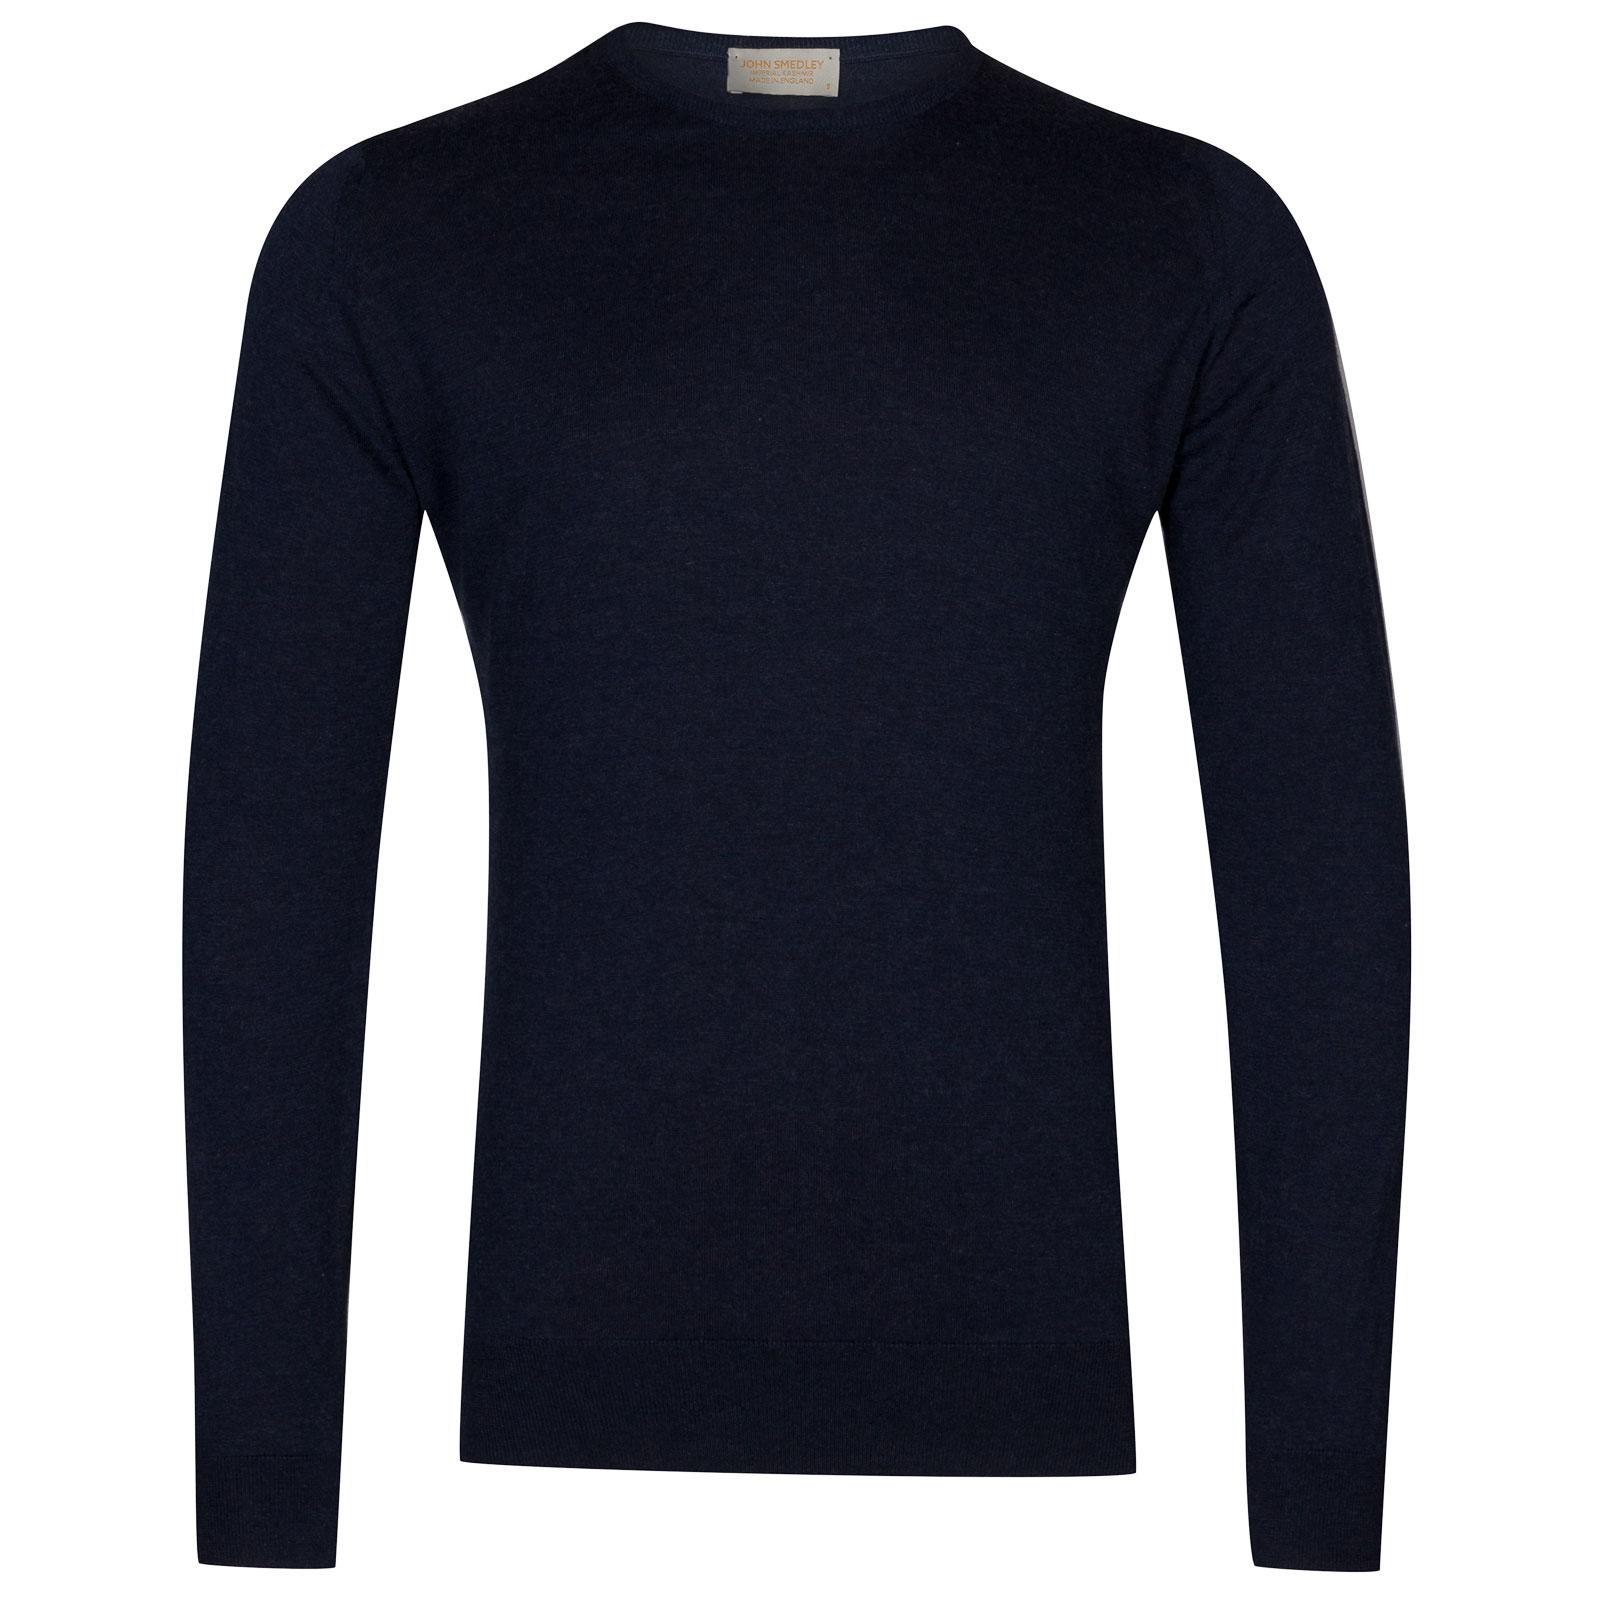 John Smedley theon Sea Island Cotton and Cashmere Pullover in Indigo-M